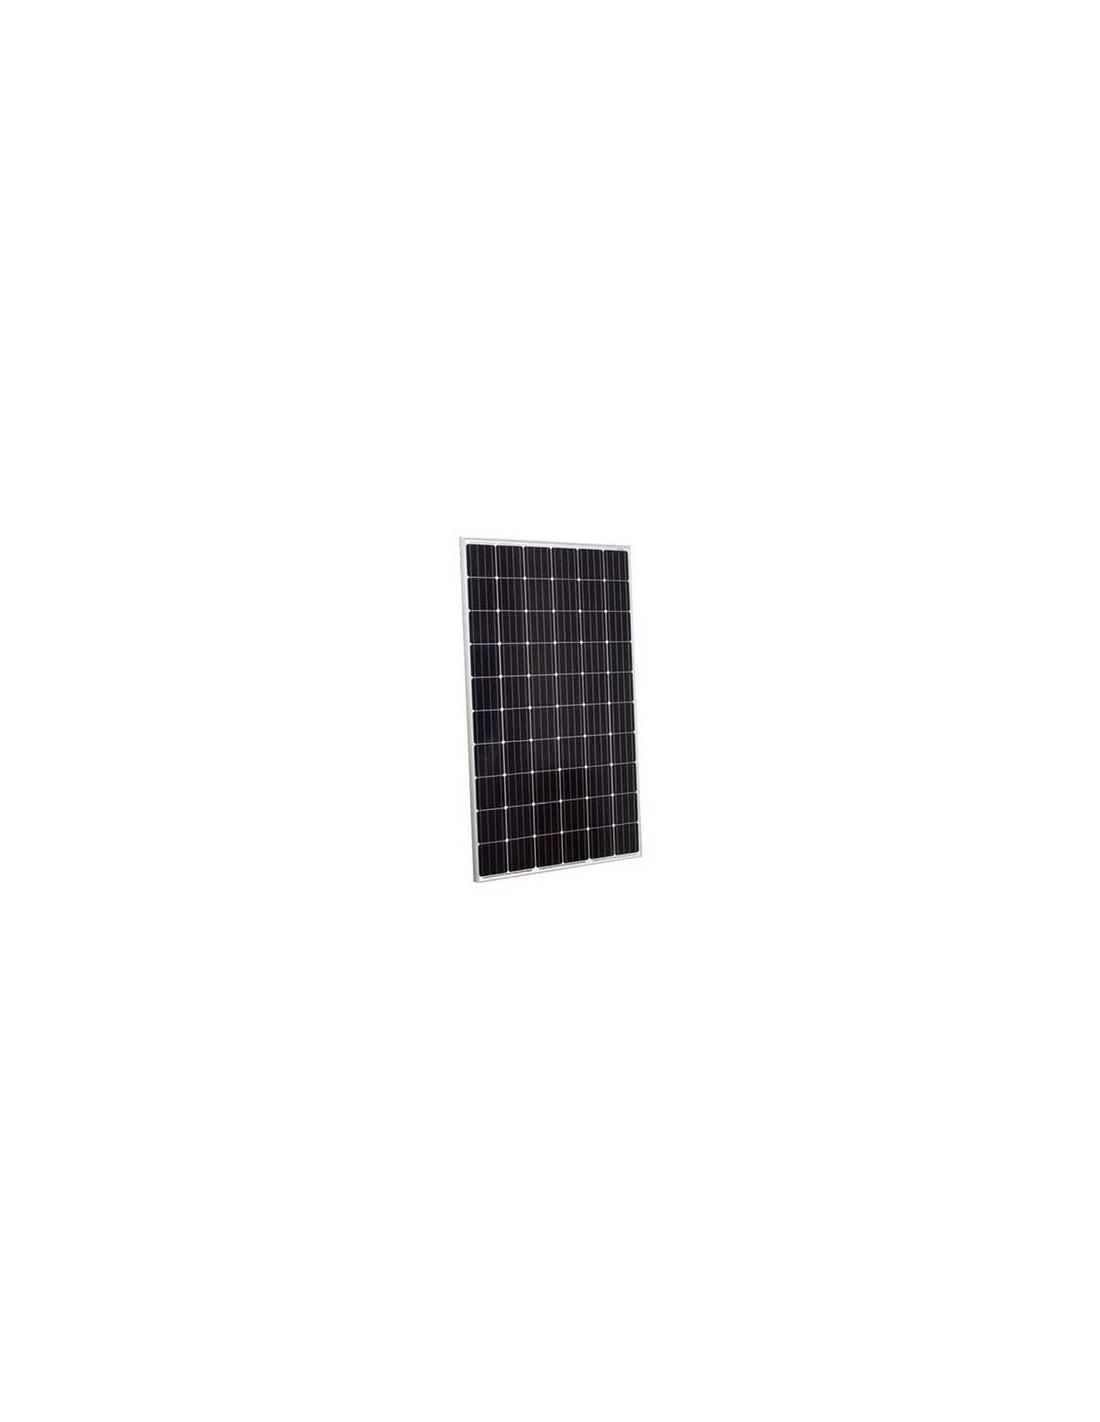 Jinko Maxim Cheetah Silver Solar PV Panel 315 Wp